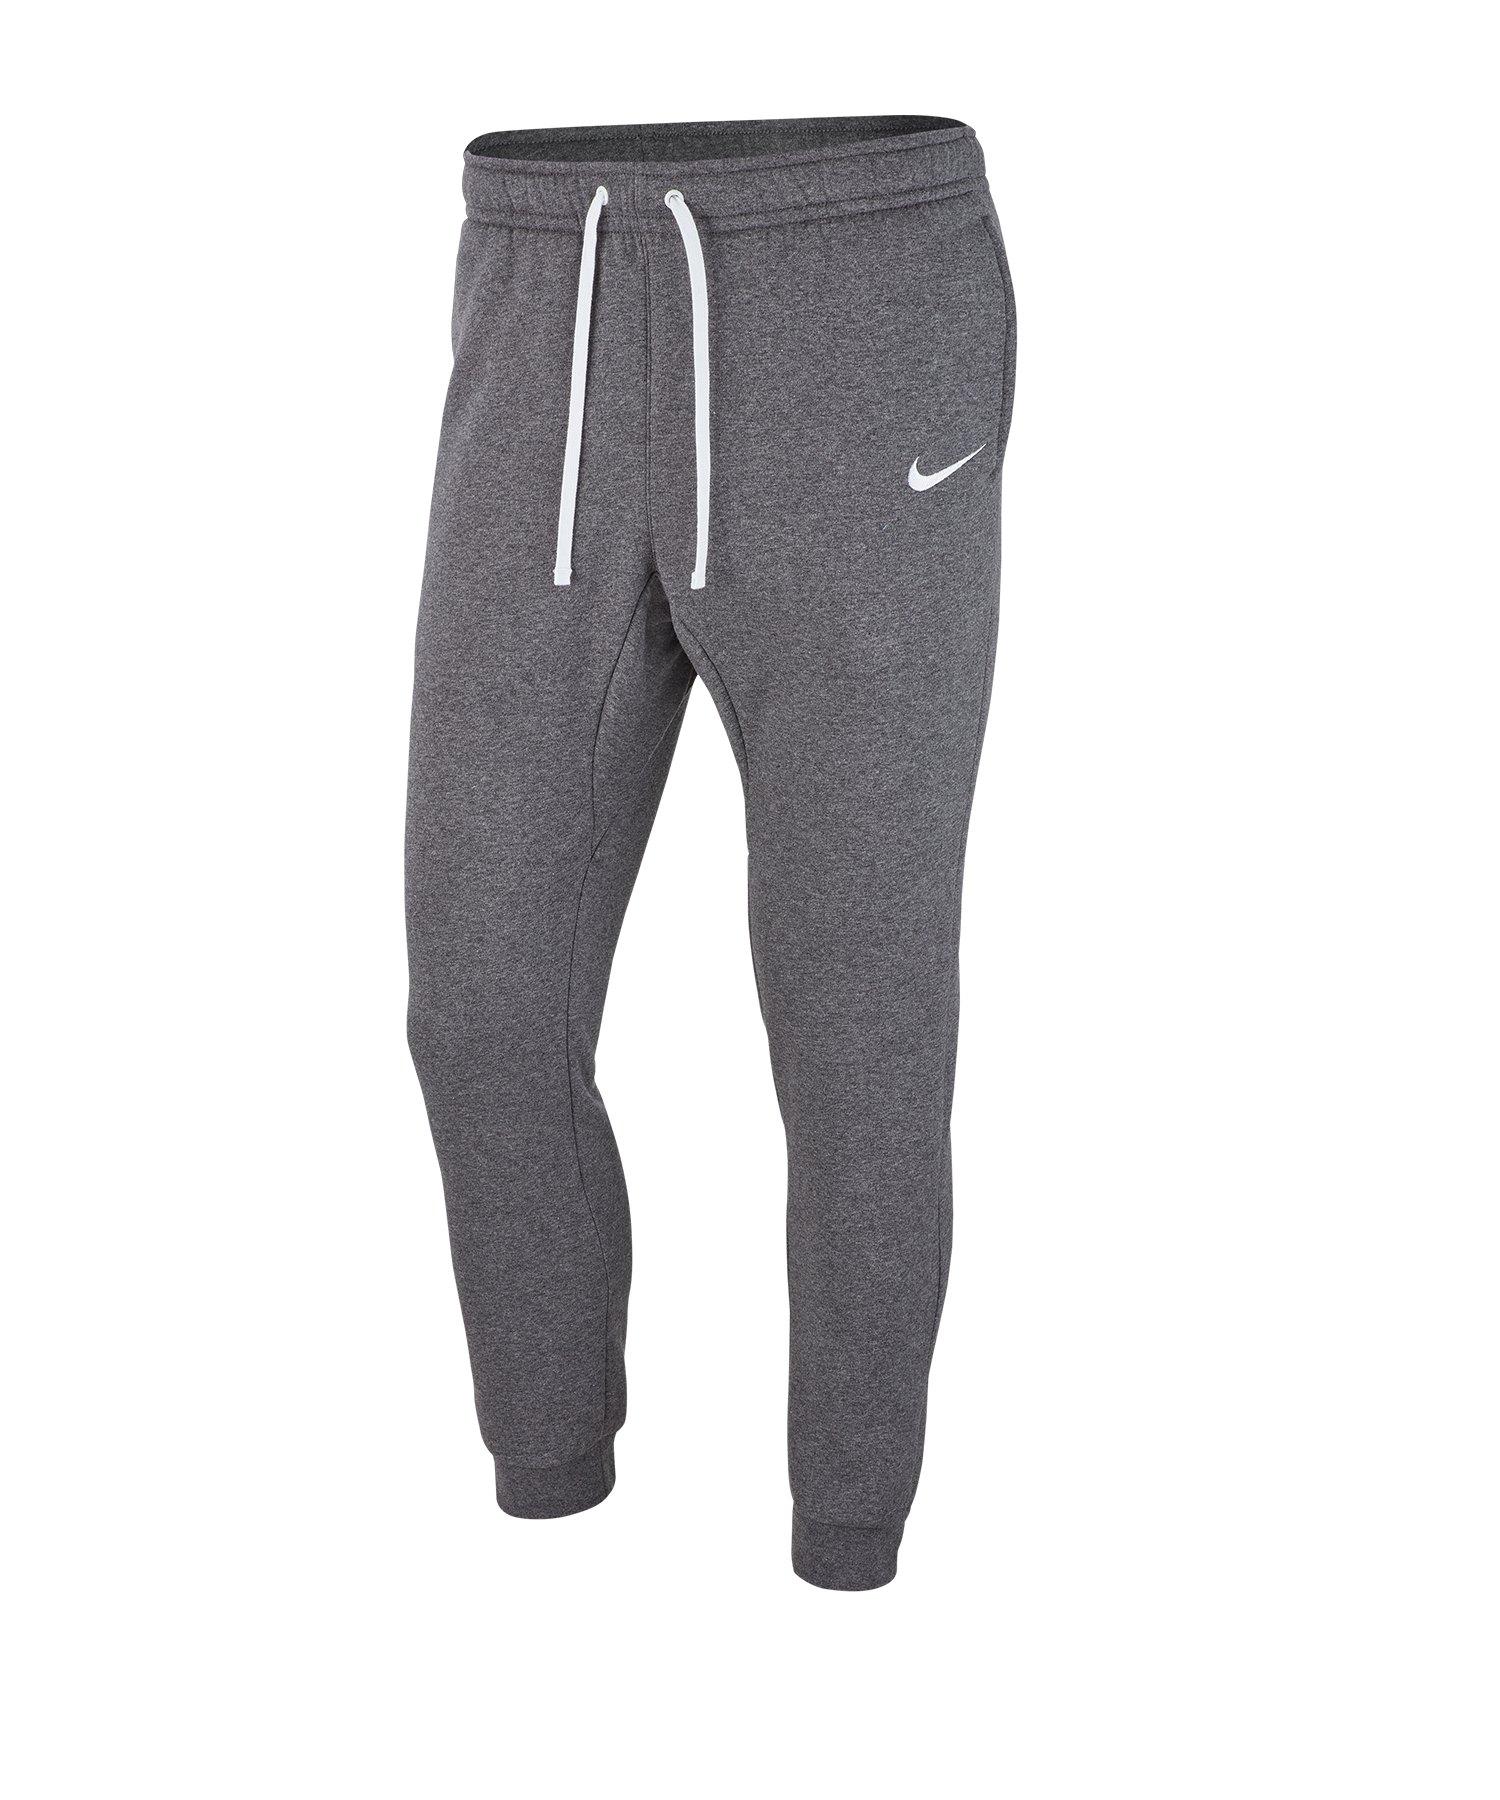 präsentieren Fang kaufen Nike Team Club 19 Fleece Jogginghose Kids F071